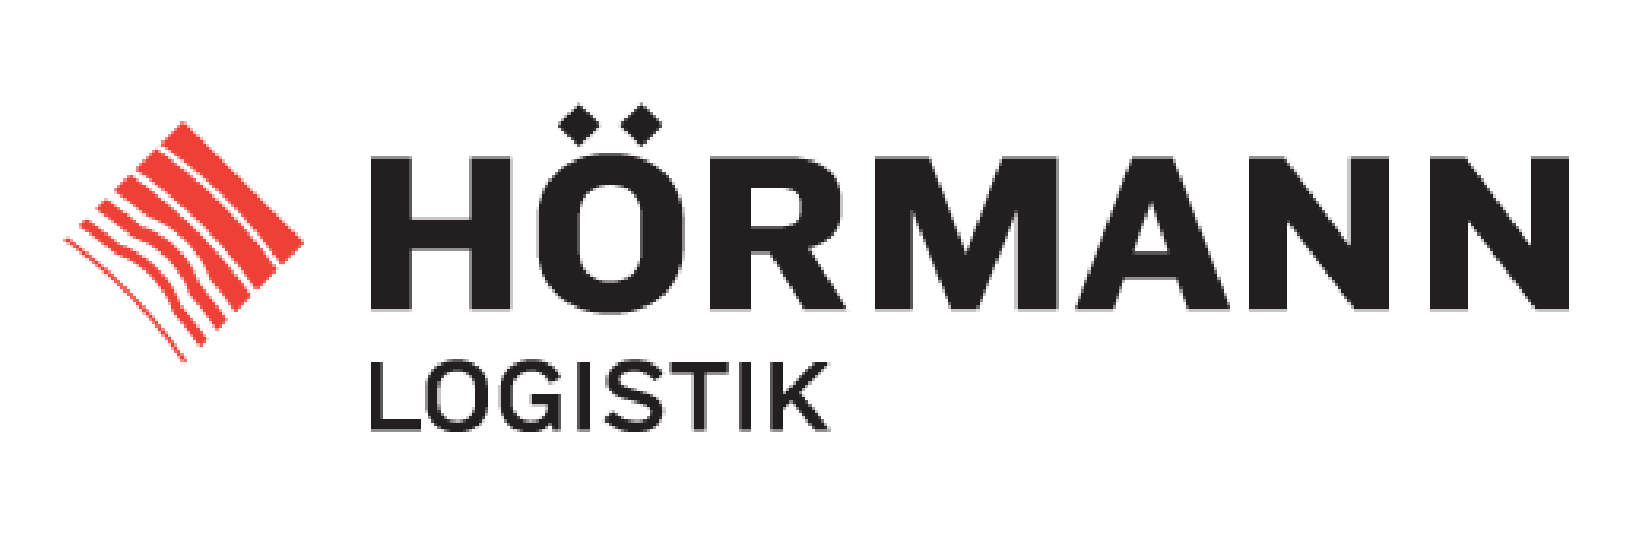 Hörmann Logistik GmbH